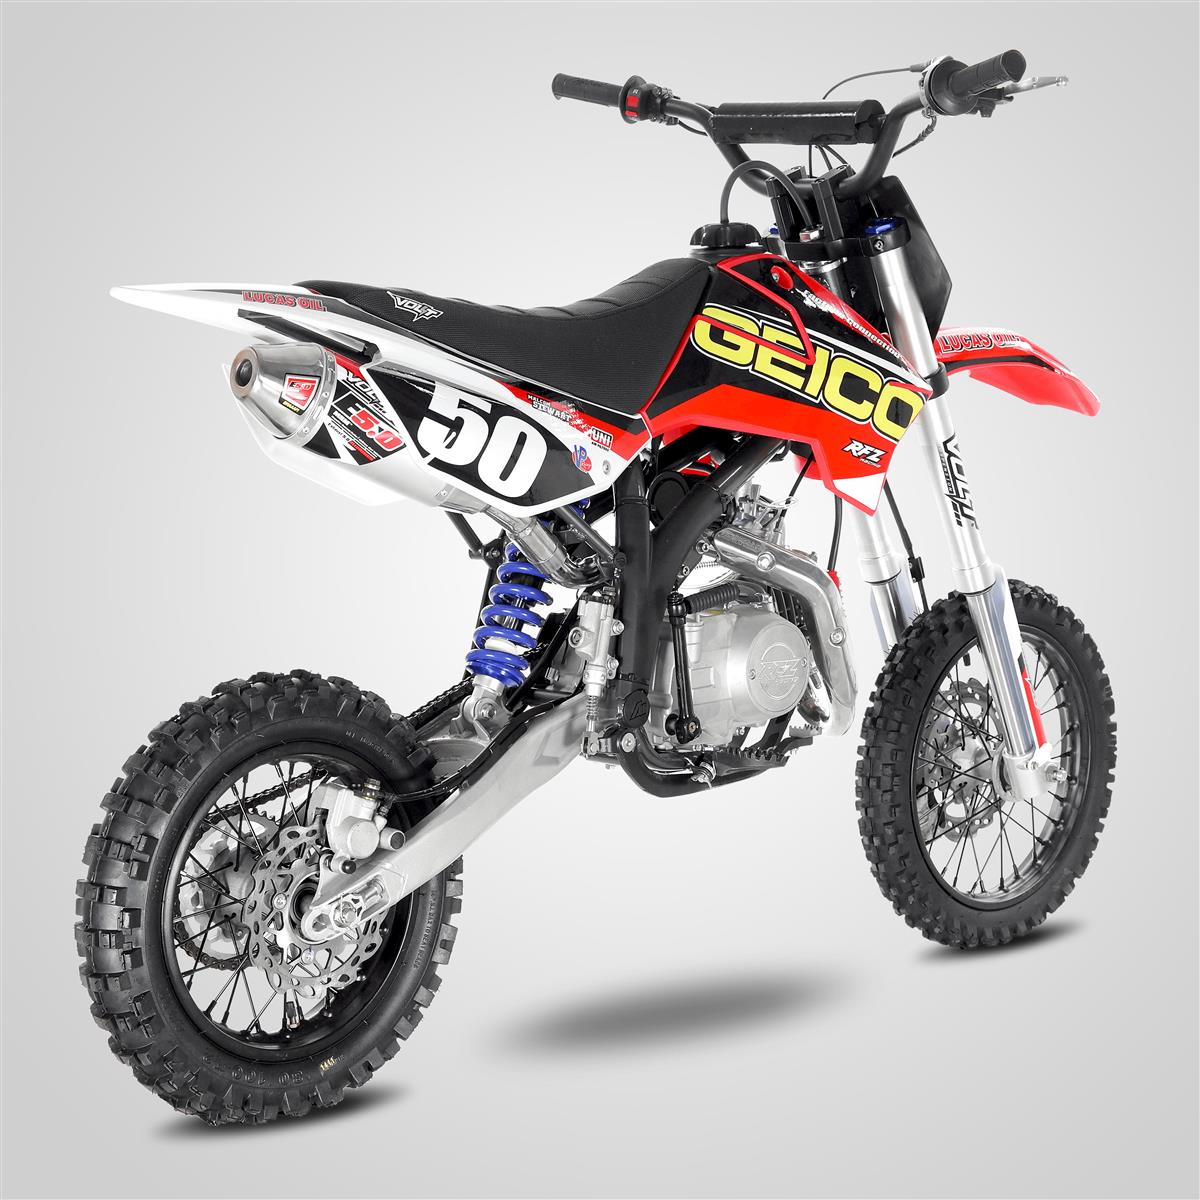 pack kit plastique kit d 233 co geico pour rfz apollo motors smallmx dirt bike pit bike